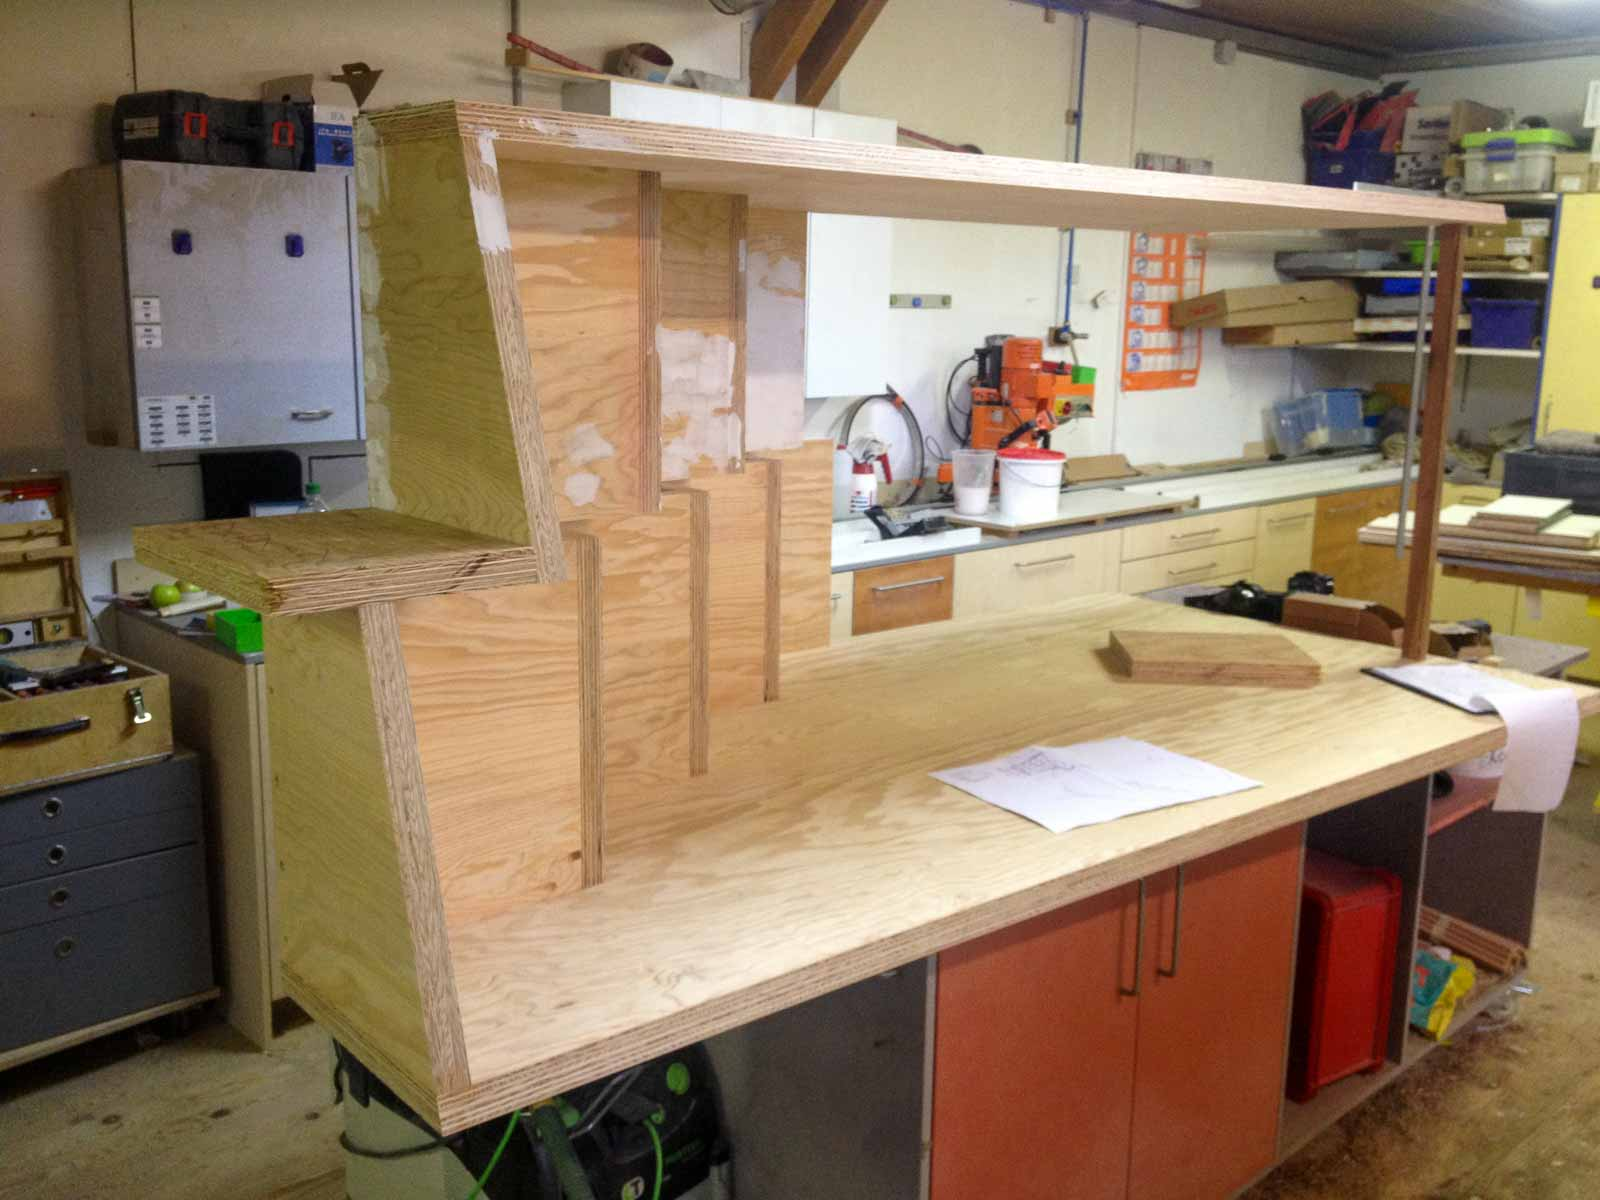 Wooddesign_Holzdesign_Treppe_Holztreppe_schwebend_2-teilig_atelierducret_freiburg(4)